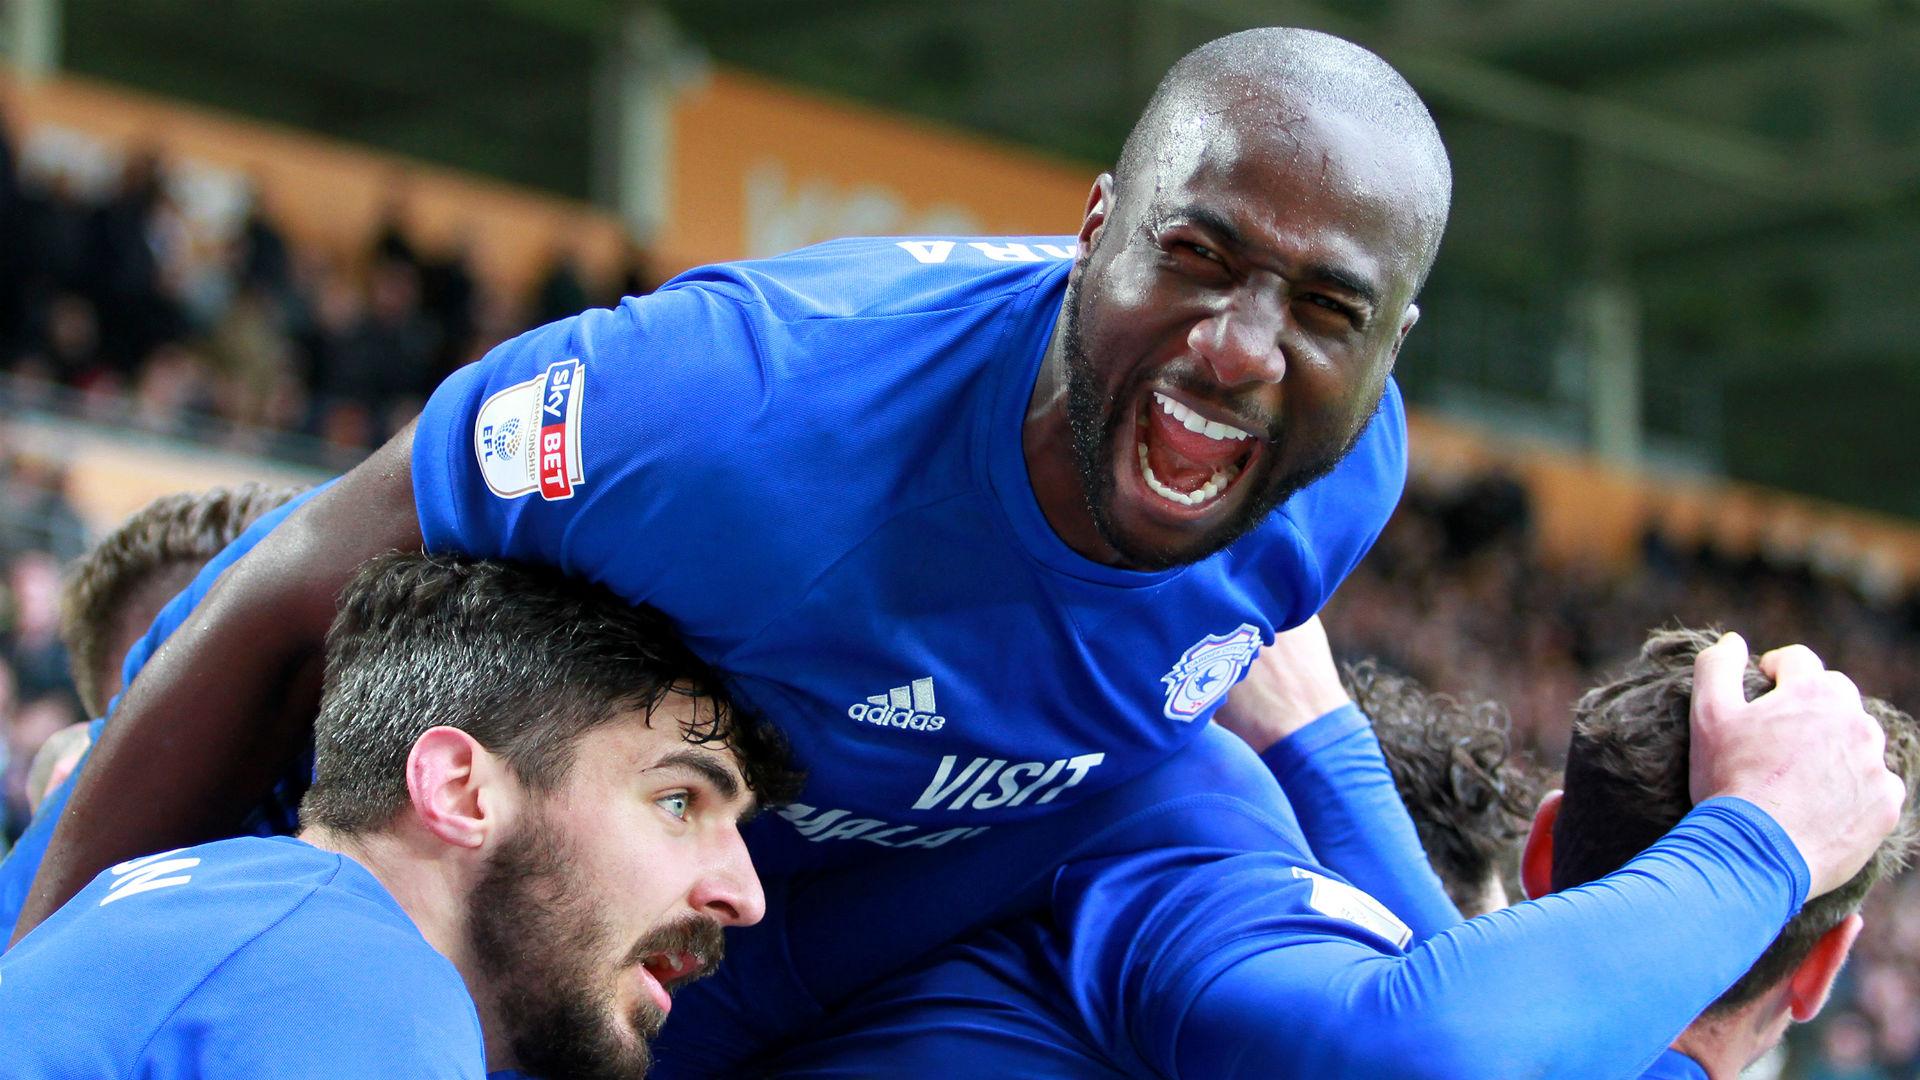 Cardiff City 2 Brighton and Hove Albion 1: Bamba the hero as Bluebirds break down 10 men